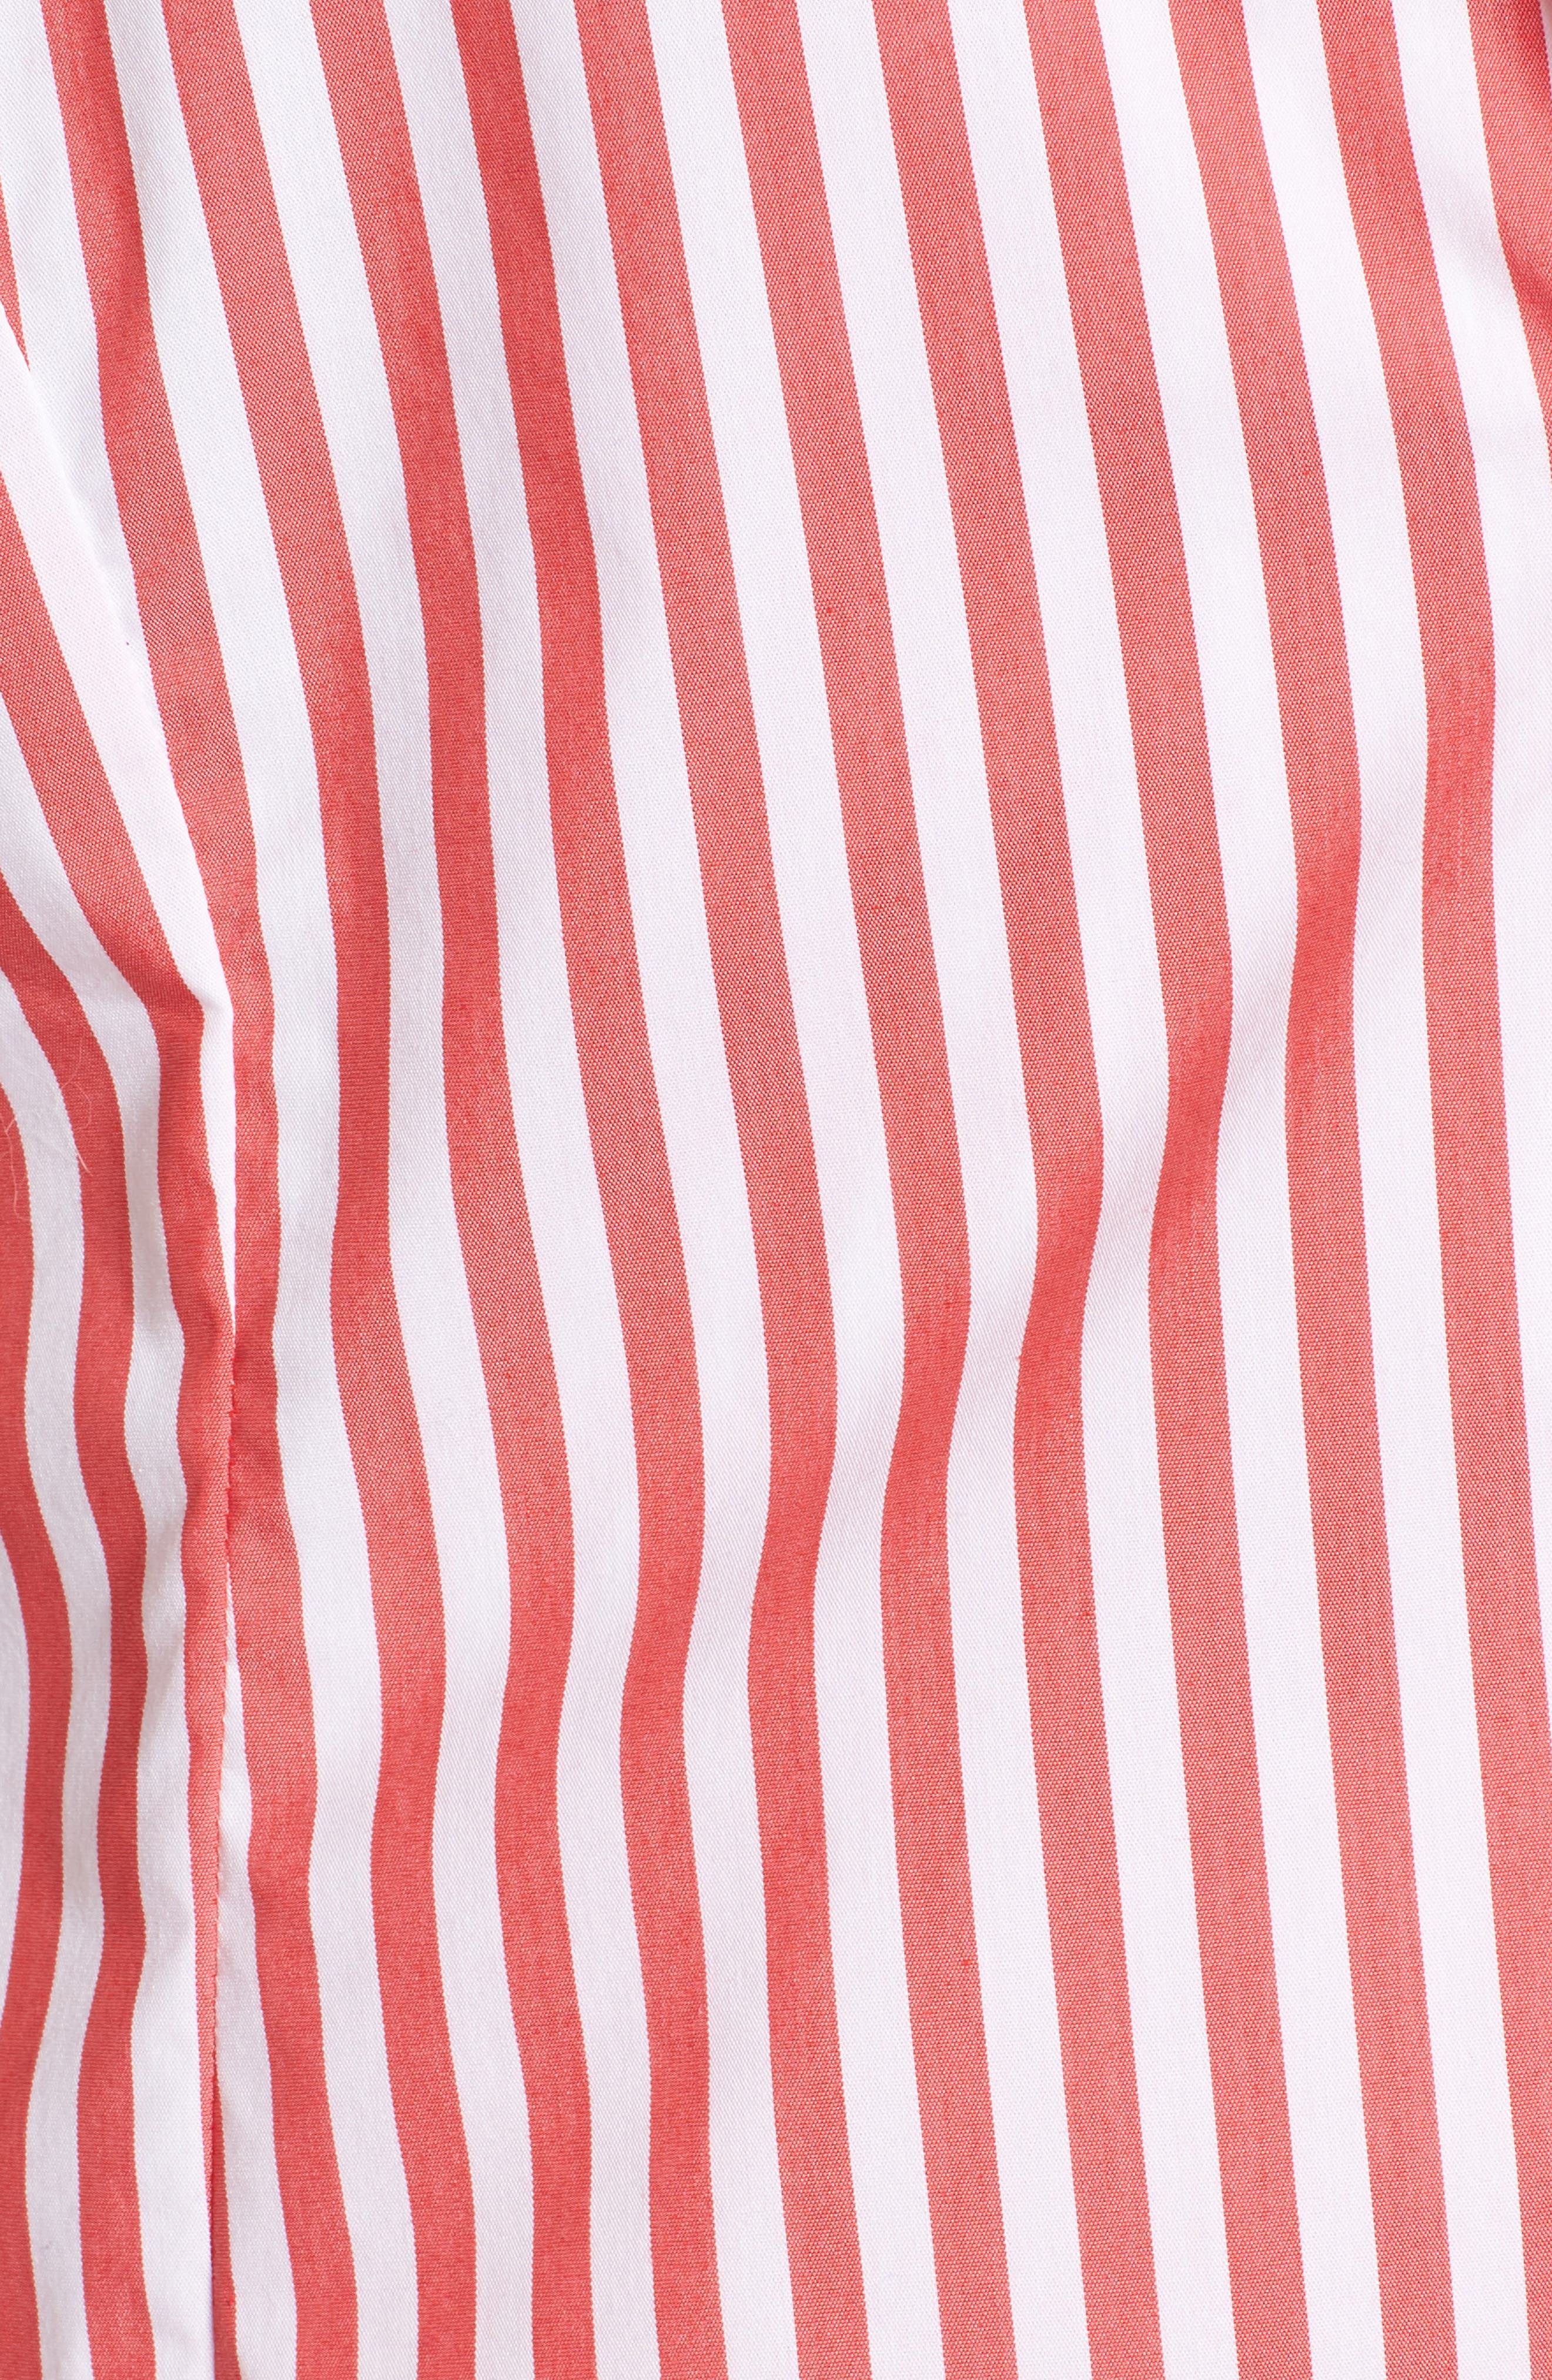 Asymmetrical Stripe Blouse,                             Alternate thumbnail 6, color,                             RED/ WHITE STRIPE